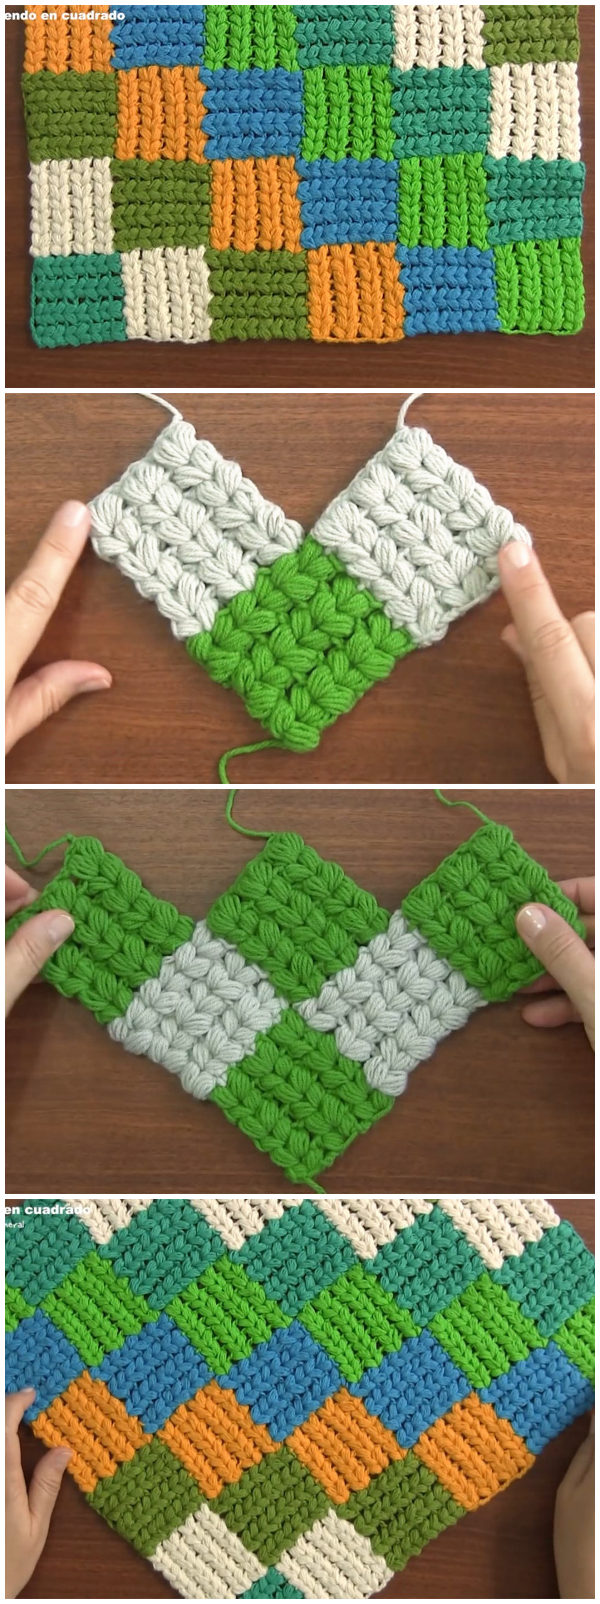 Interlaced Braid Stitch Crochet Pattern